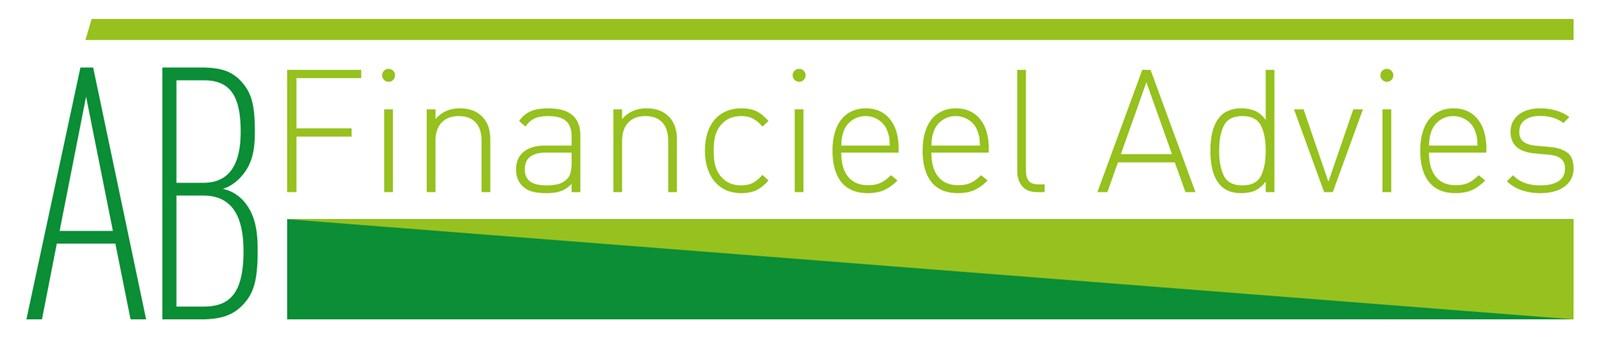 Logo van AB Financieel Advies